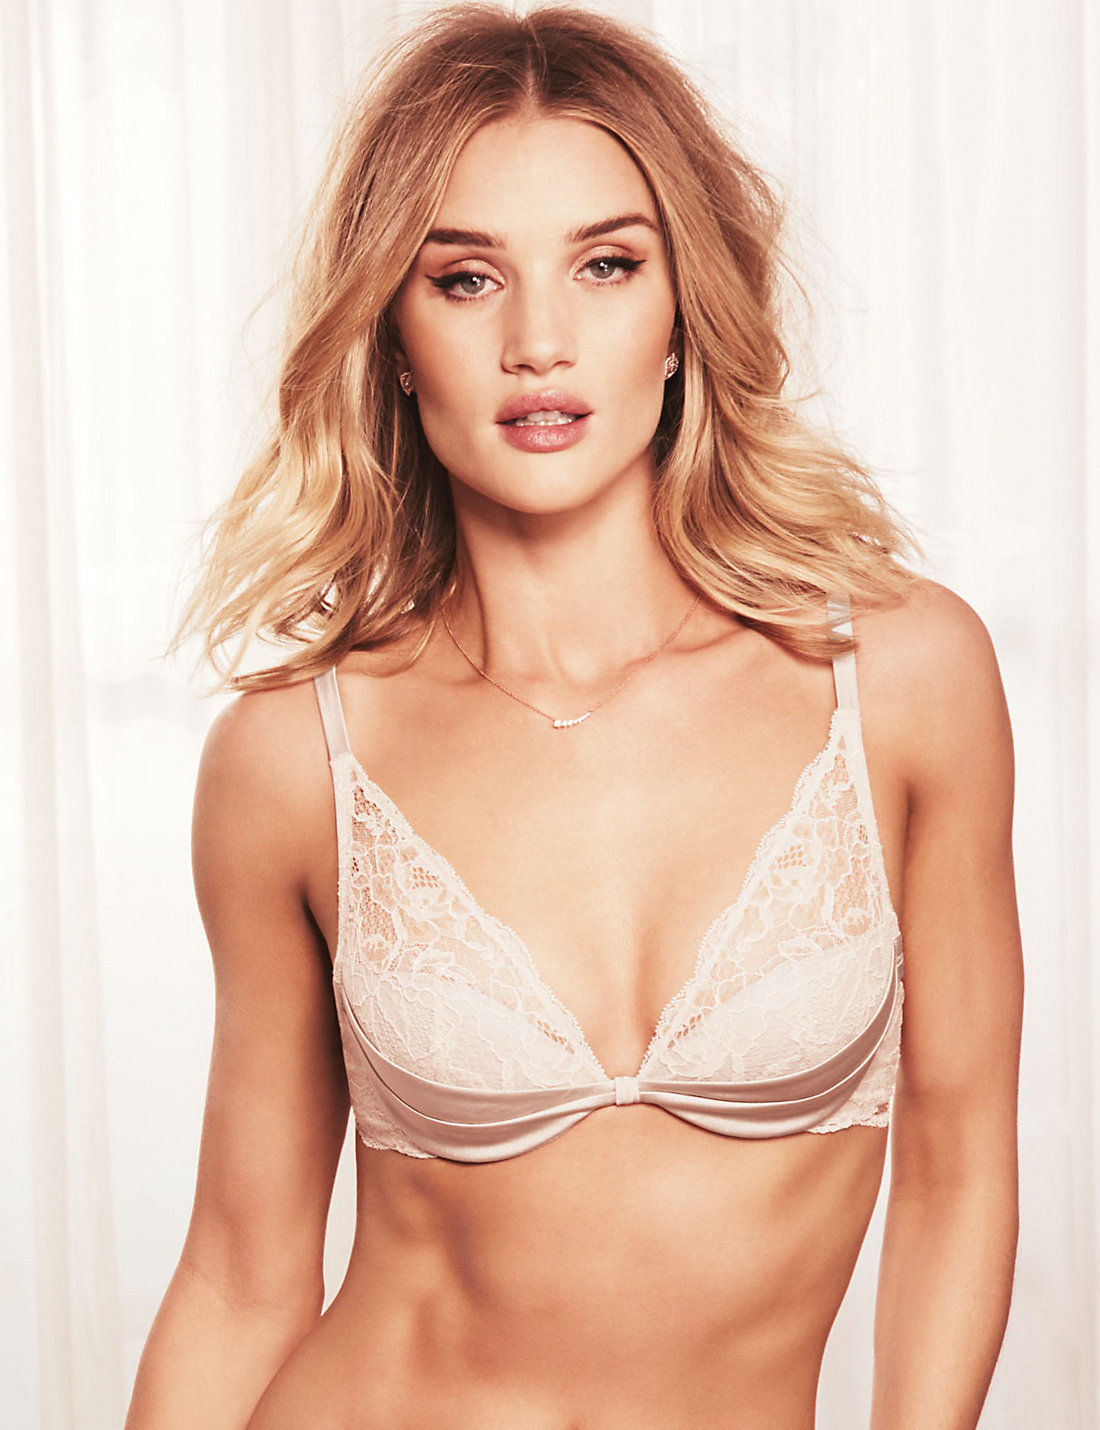 Bridal Lingerie | Wedding Underwear & Nightwear | M&S